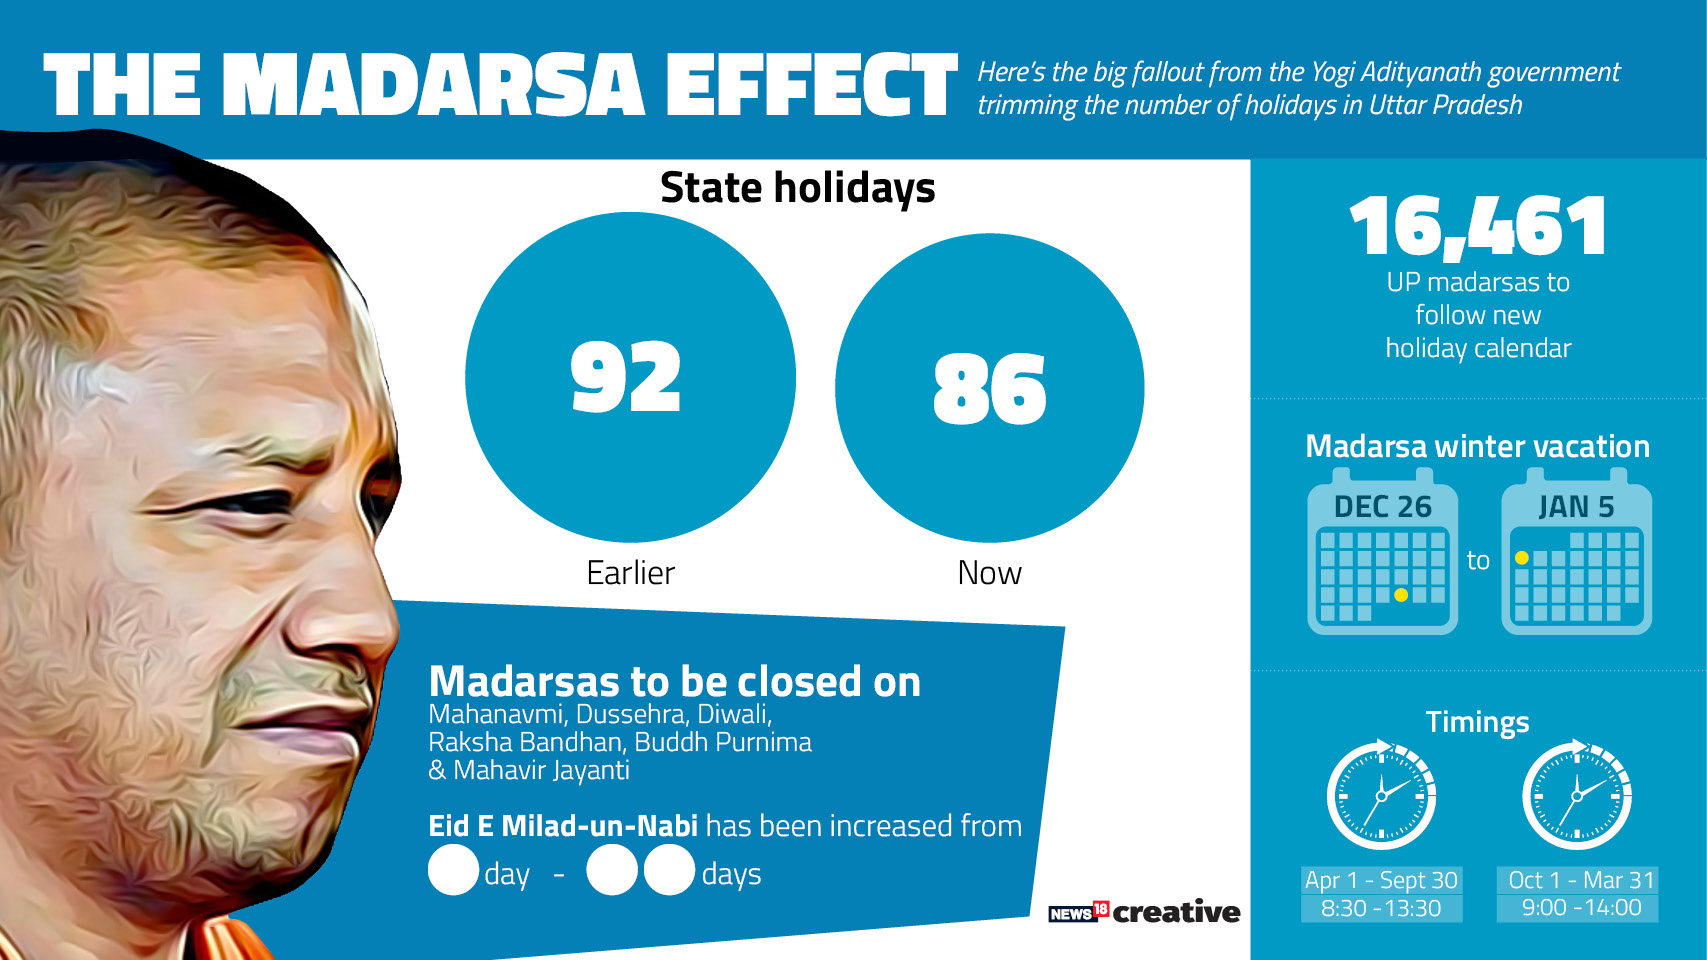 The Madarsa Effect